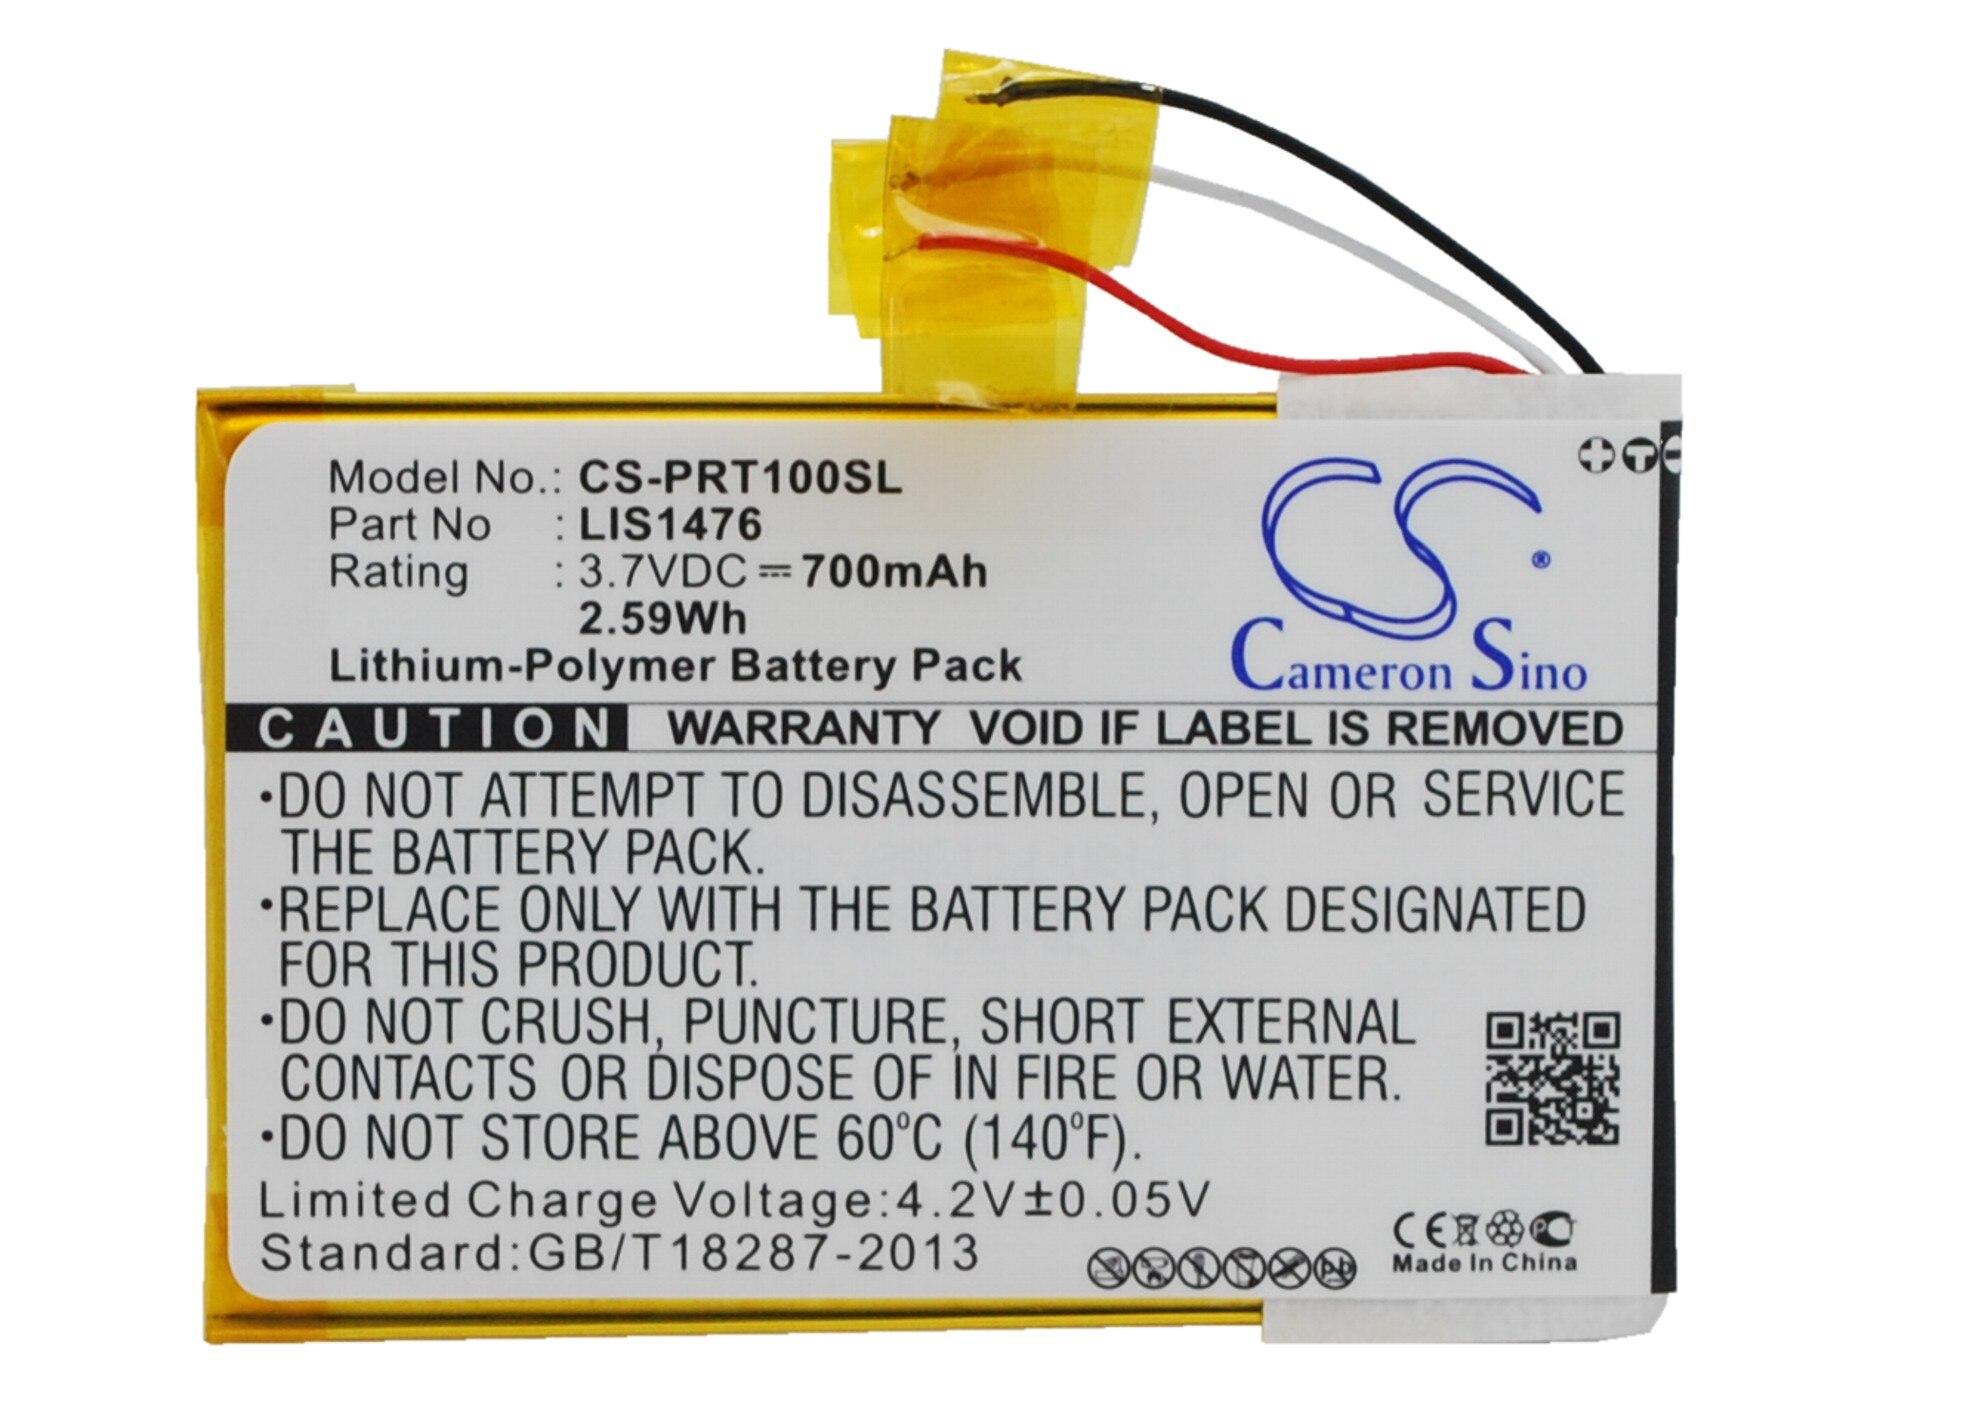 Cameron Sino 700mAh Battery 1-853-104-11, LIS1476, LIS1476MHPPC(SY6) for Sony PRS-T1, PRS-T2, PRS-T3, PRS-T3E, PRS-T3S электрогитара с двумя вырезами prs se custom 24 zw ltd